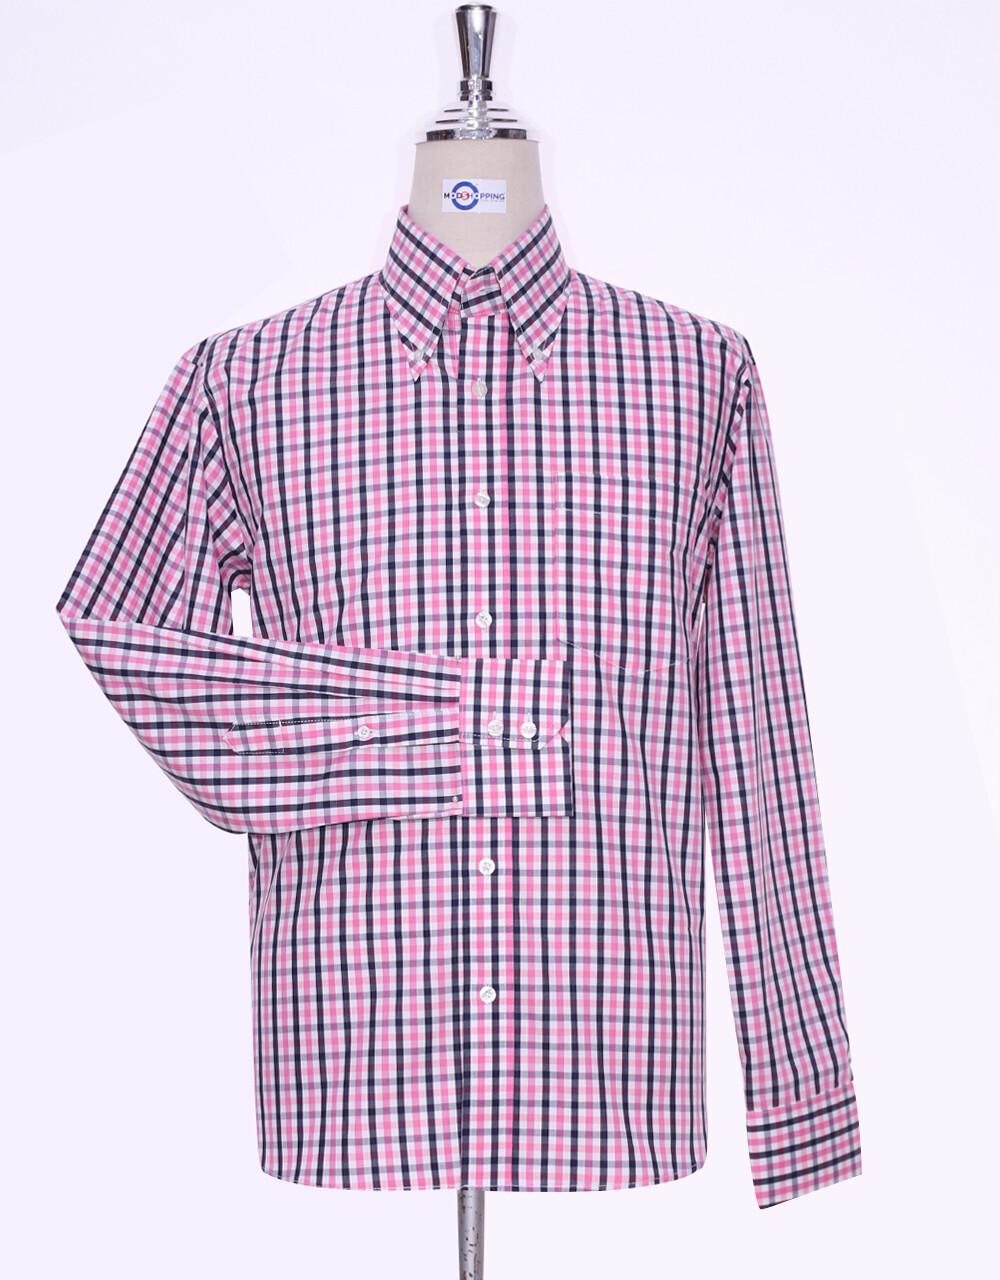 Button Down Shirt Pink And Black Windowpane Check Shirt